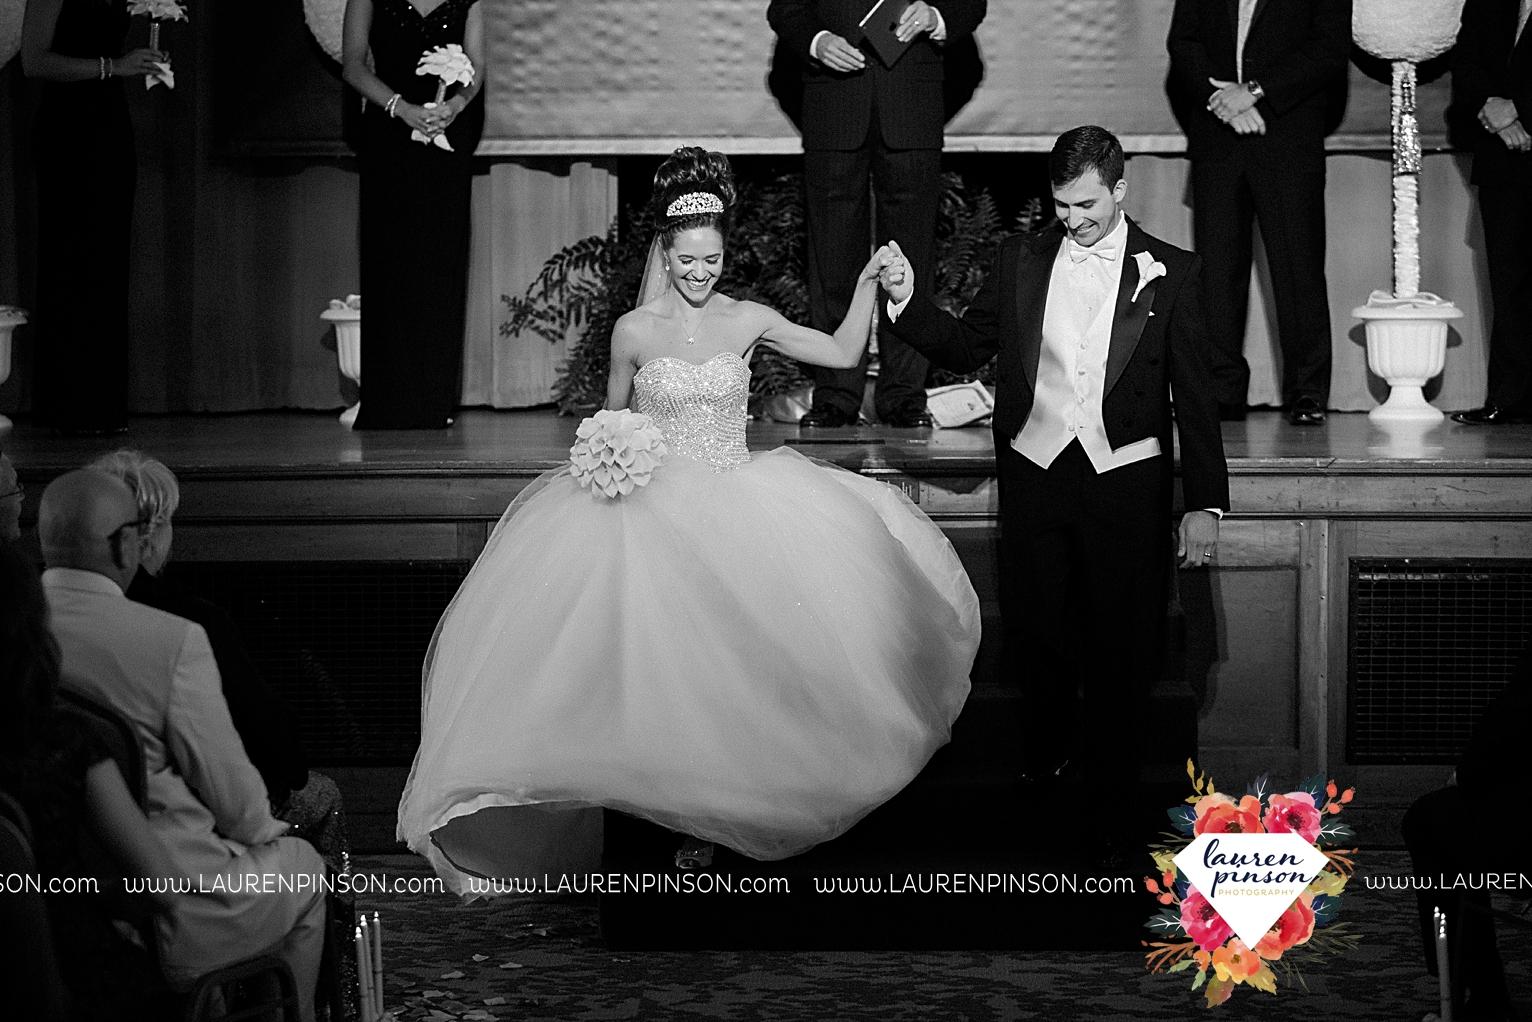 wichita-falls-texas-wedding-photographer-the-forum-by-the-kemp-mayfield-events-ulta-gold-glitter_2868.jpg